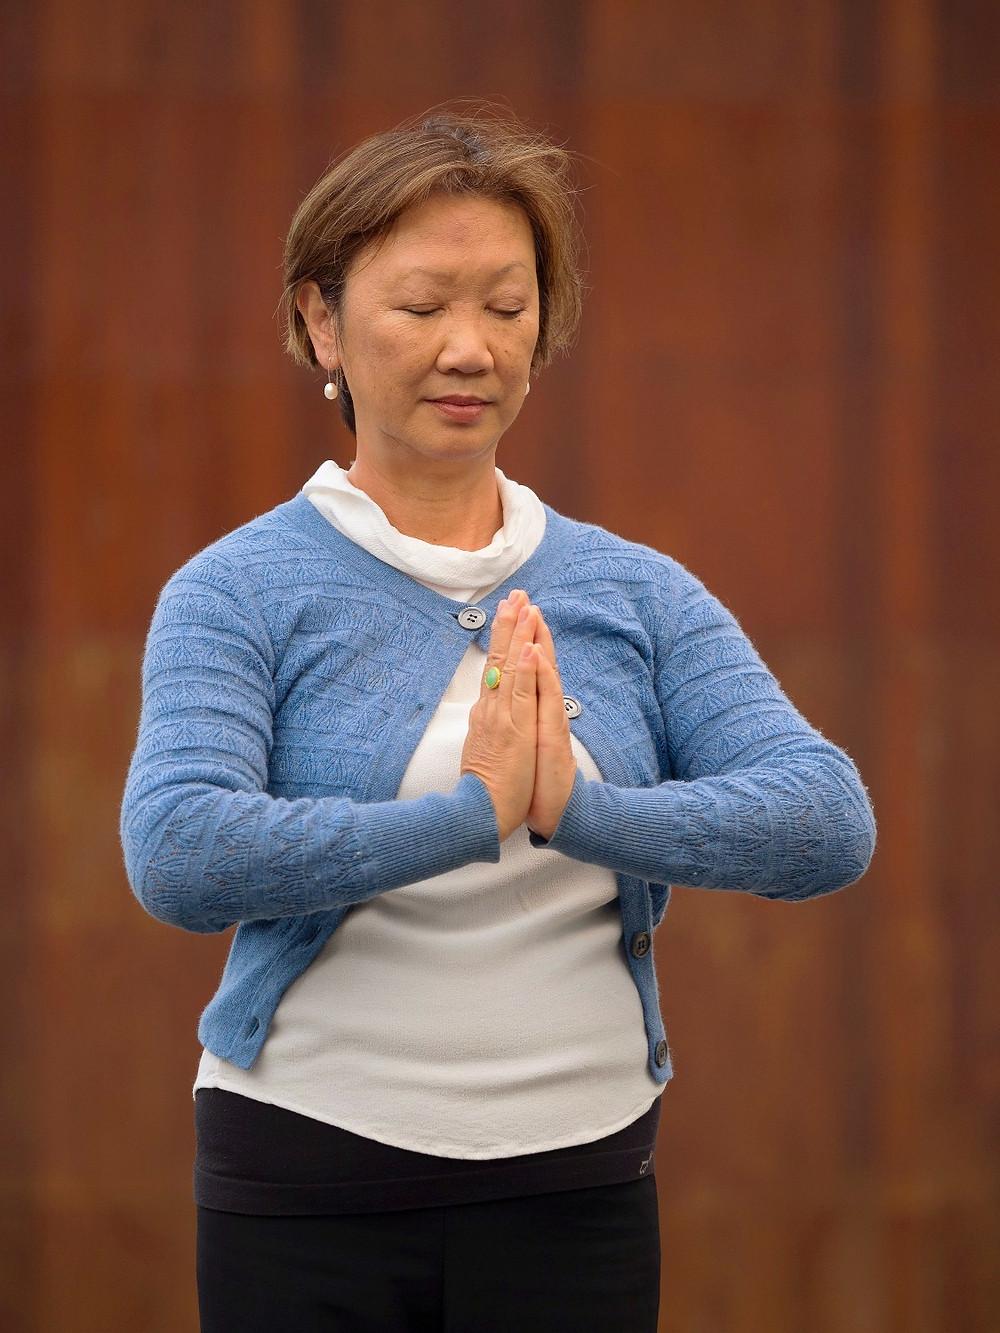 Prayer hands position